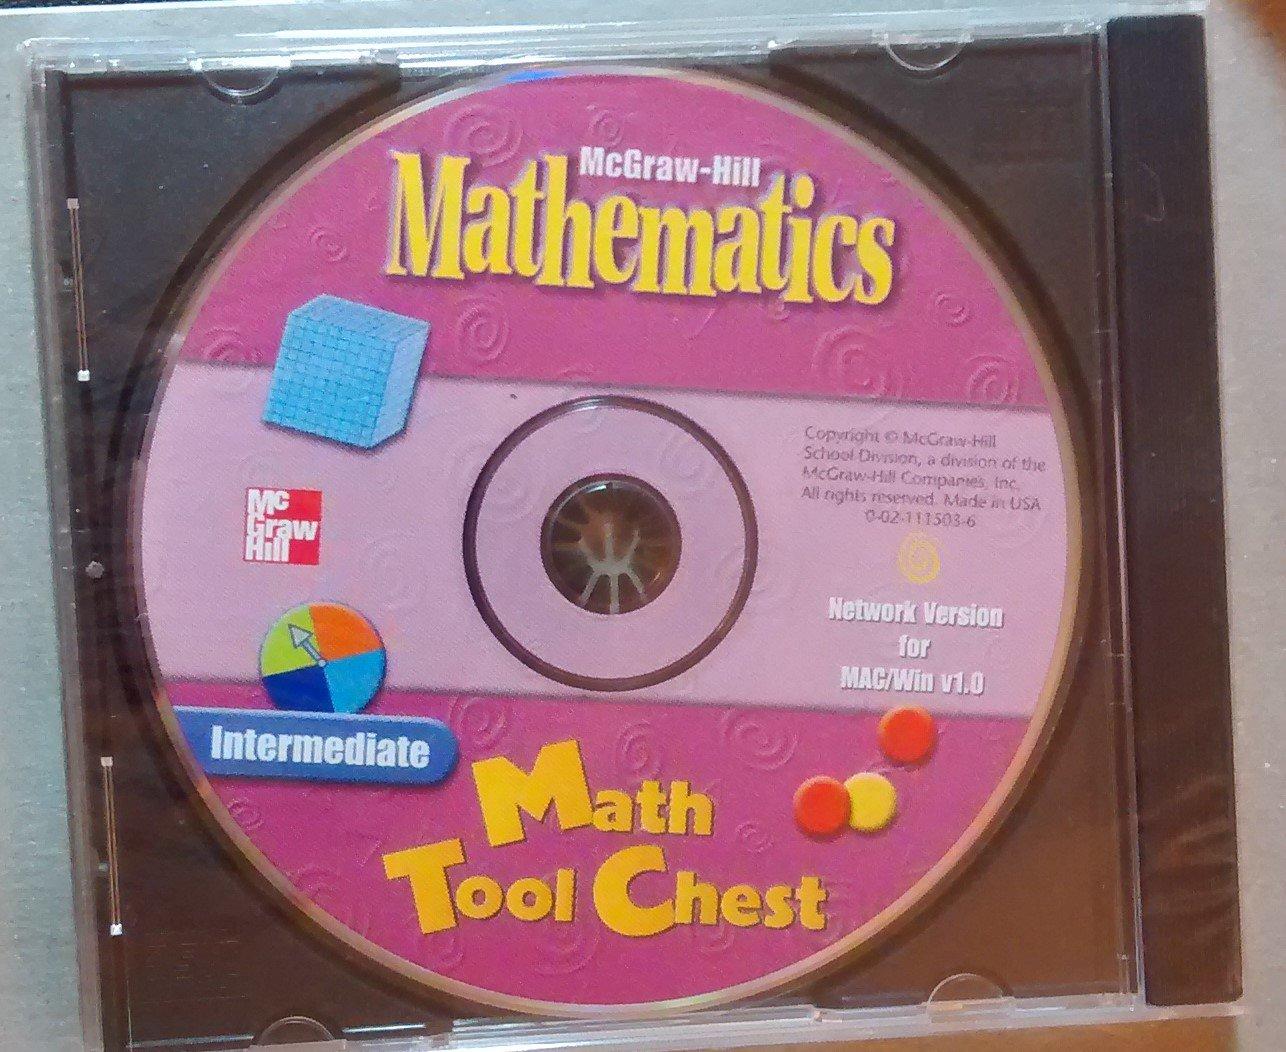 Mathematics Intermedia Math Tool Chest  Network Version- Cd-rom Mc